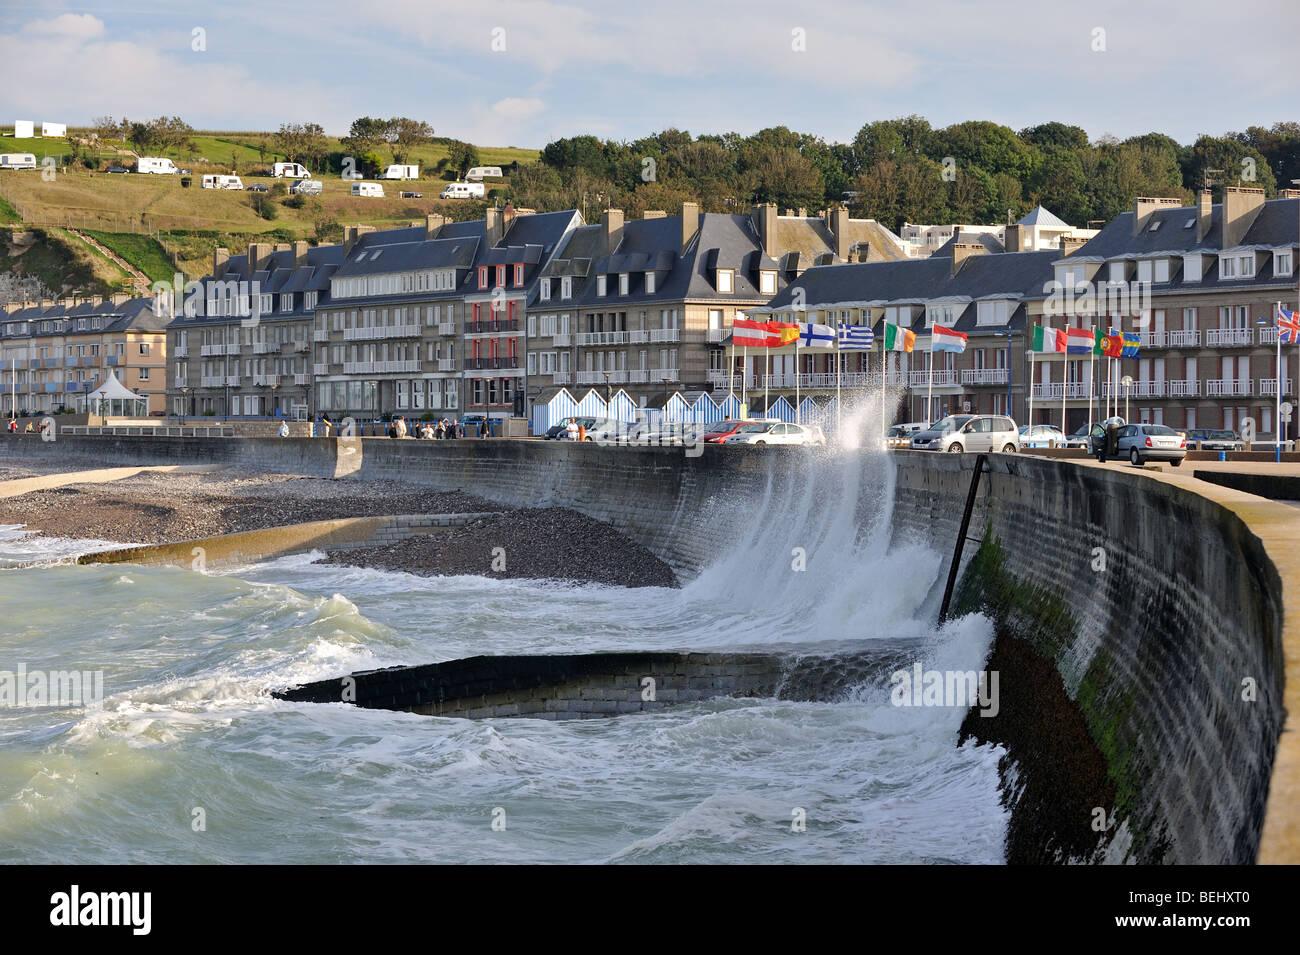 Waves crashing into sea dyke at Saint-Valery-en-Caux, Seine-Maritime, Haute-Normandie, Normandy, France - Stock Image